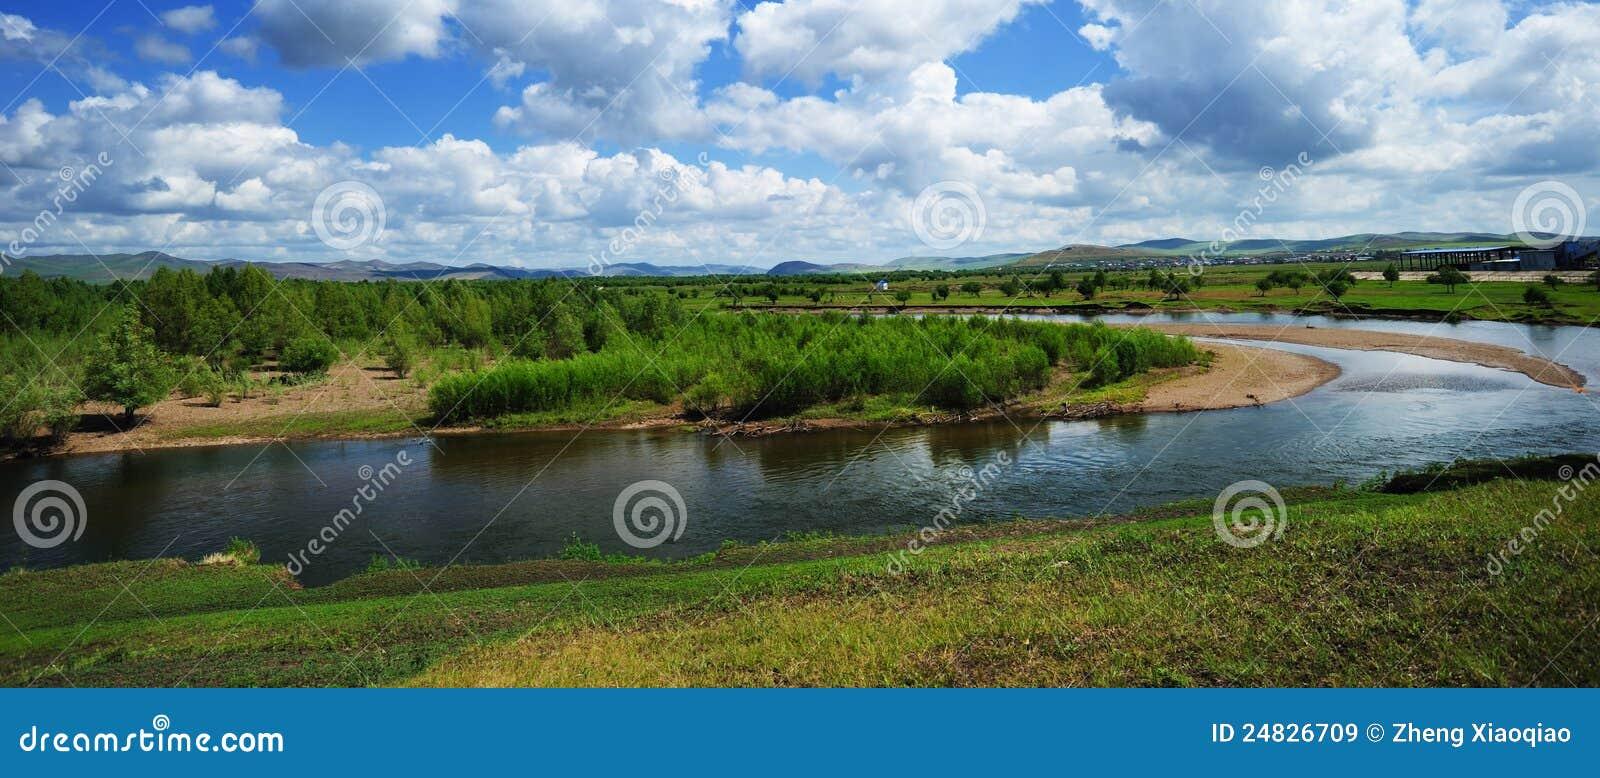 Gen River, Mongolia Province, China